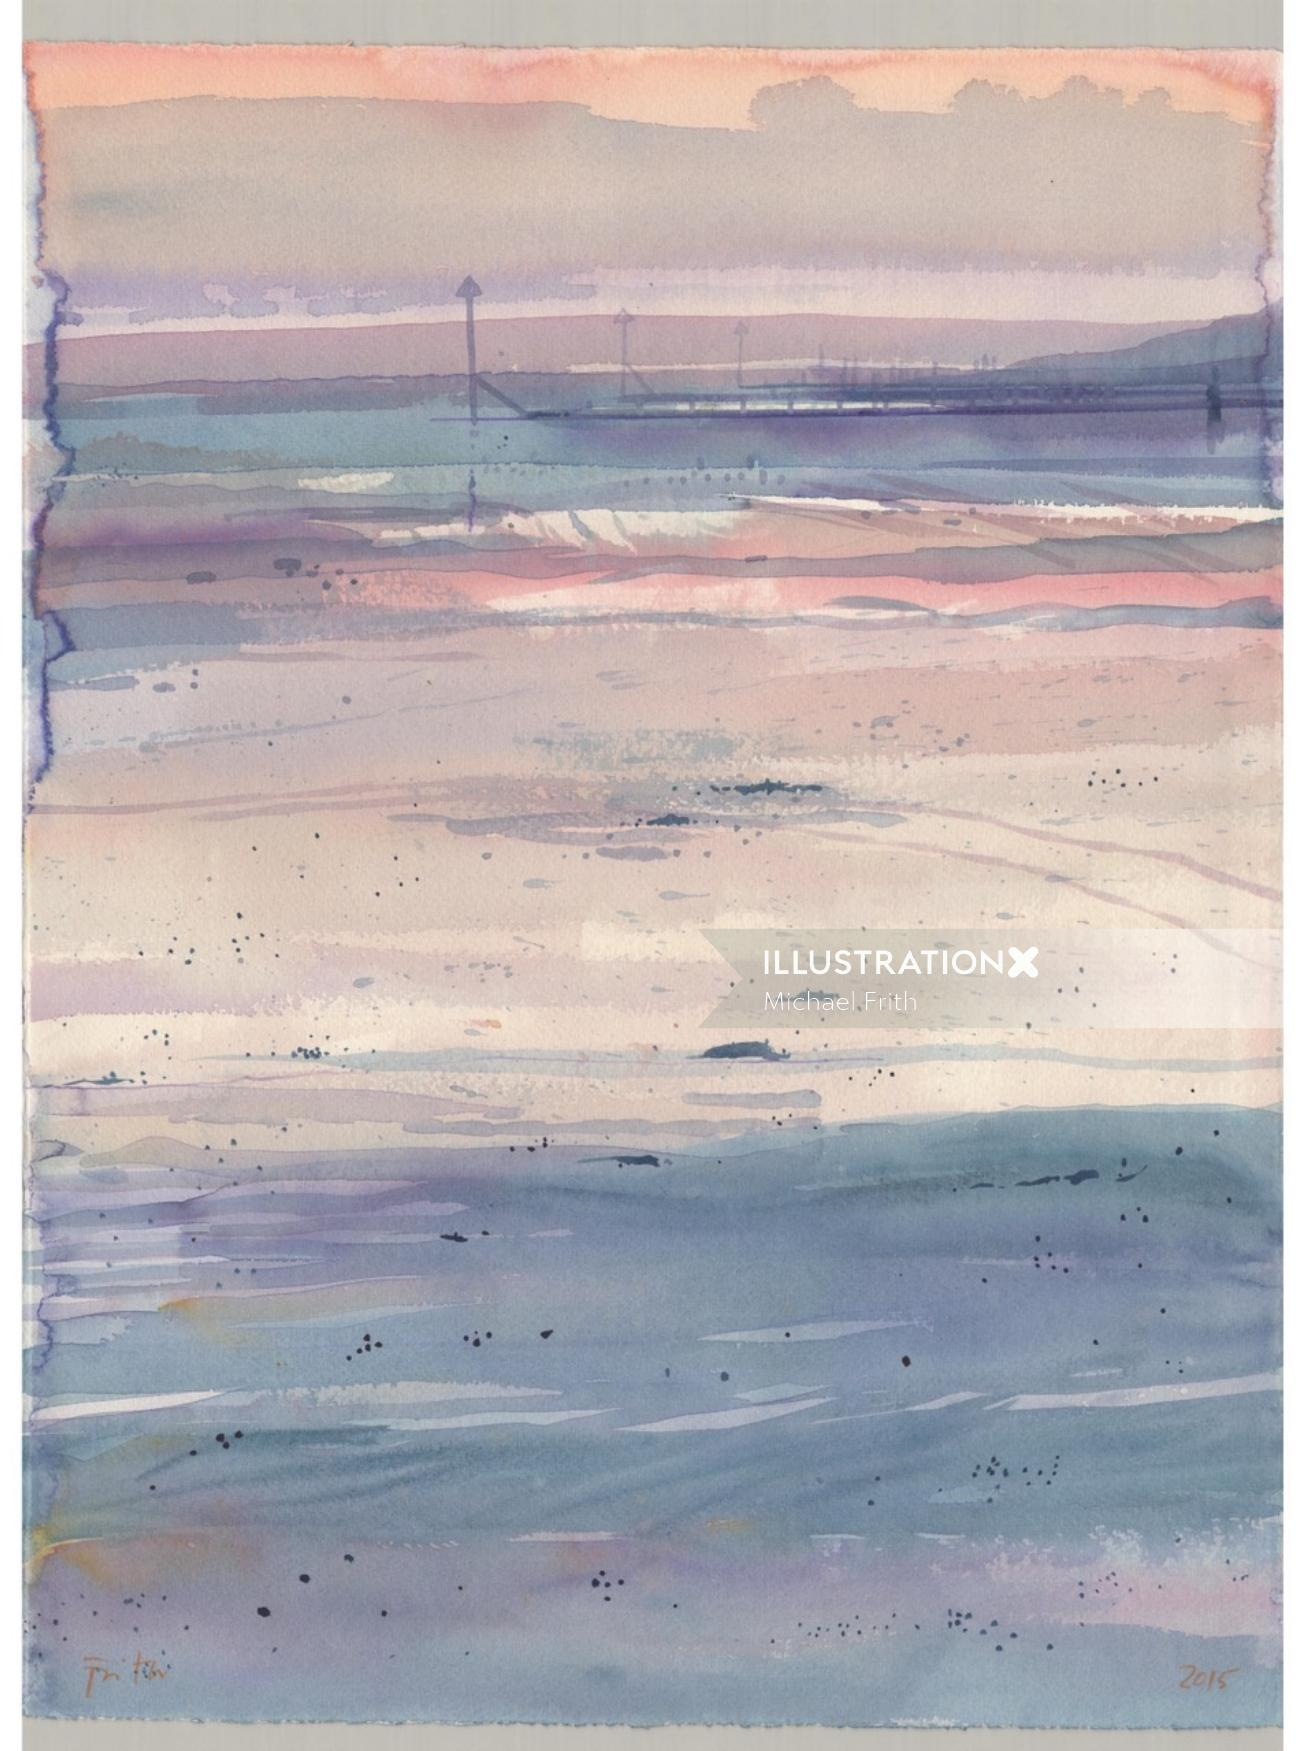 watercolor illustration of landscape